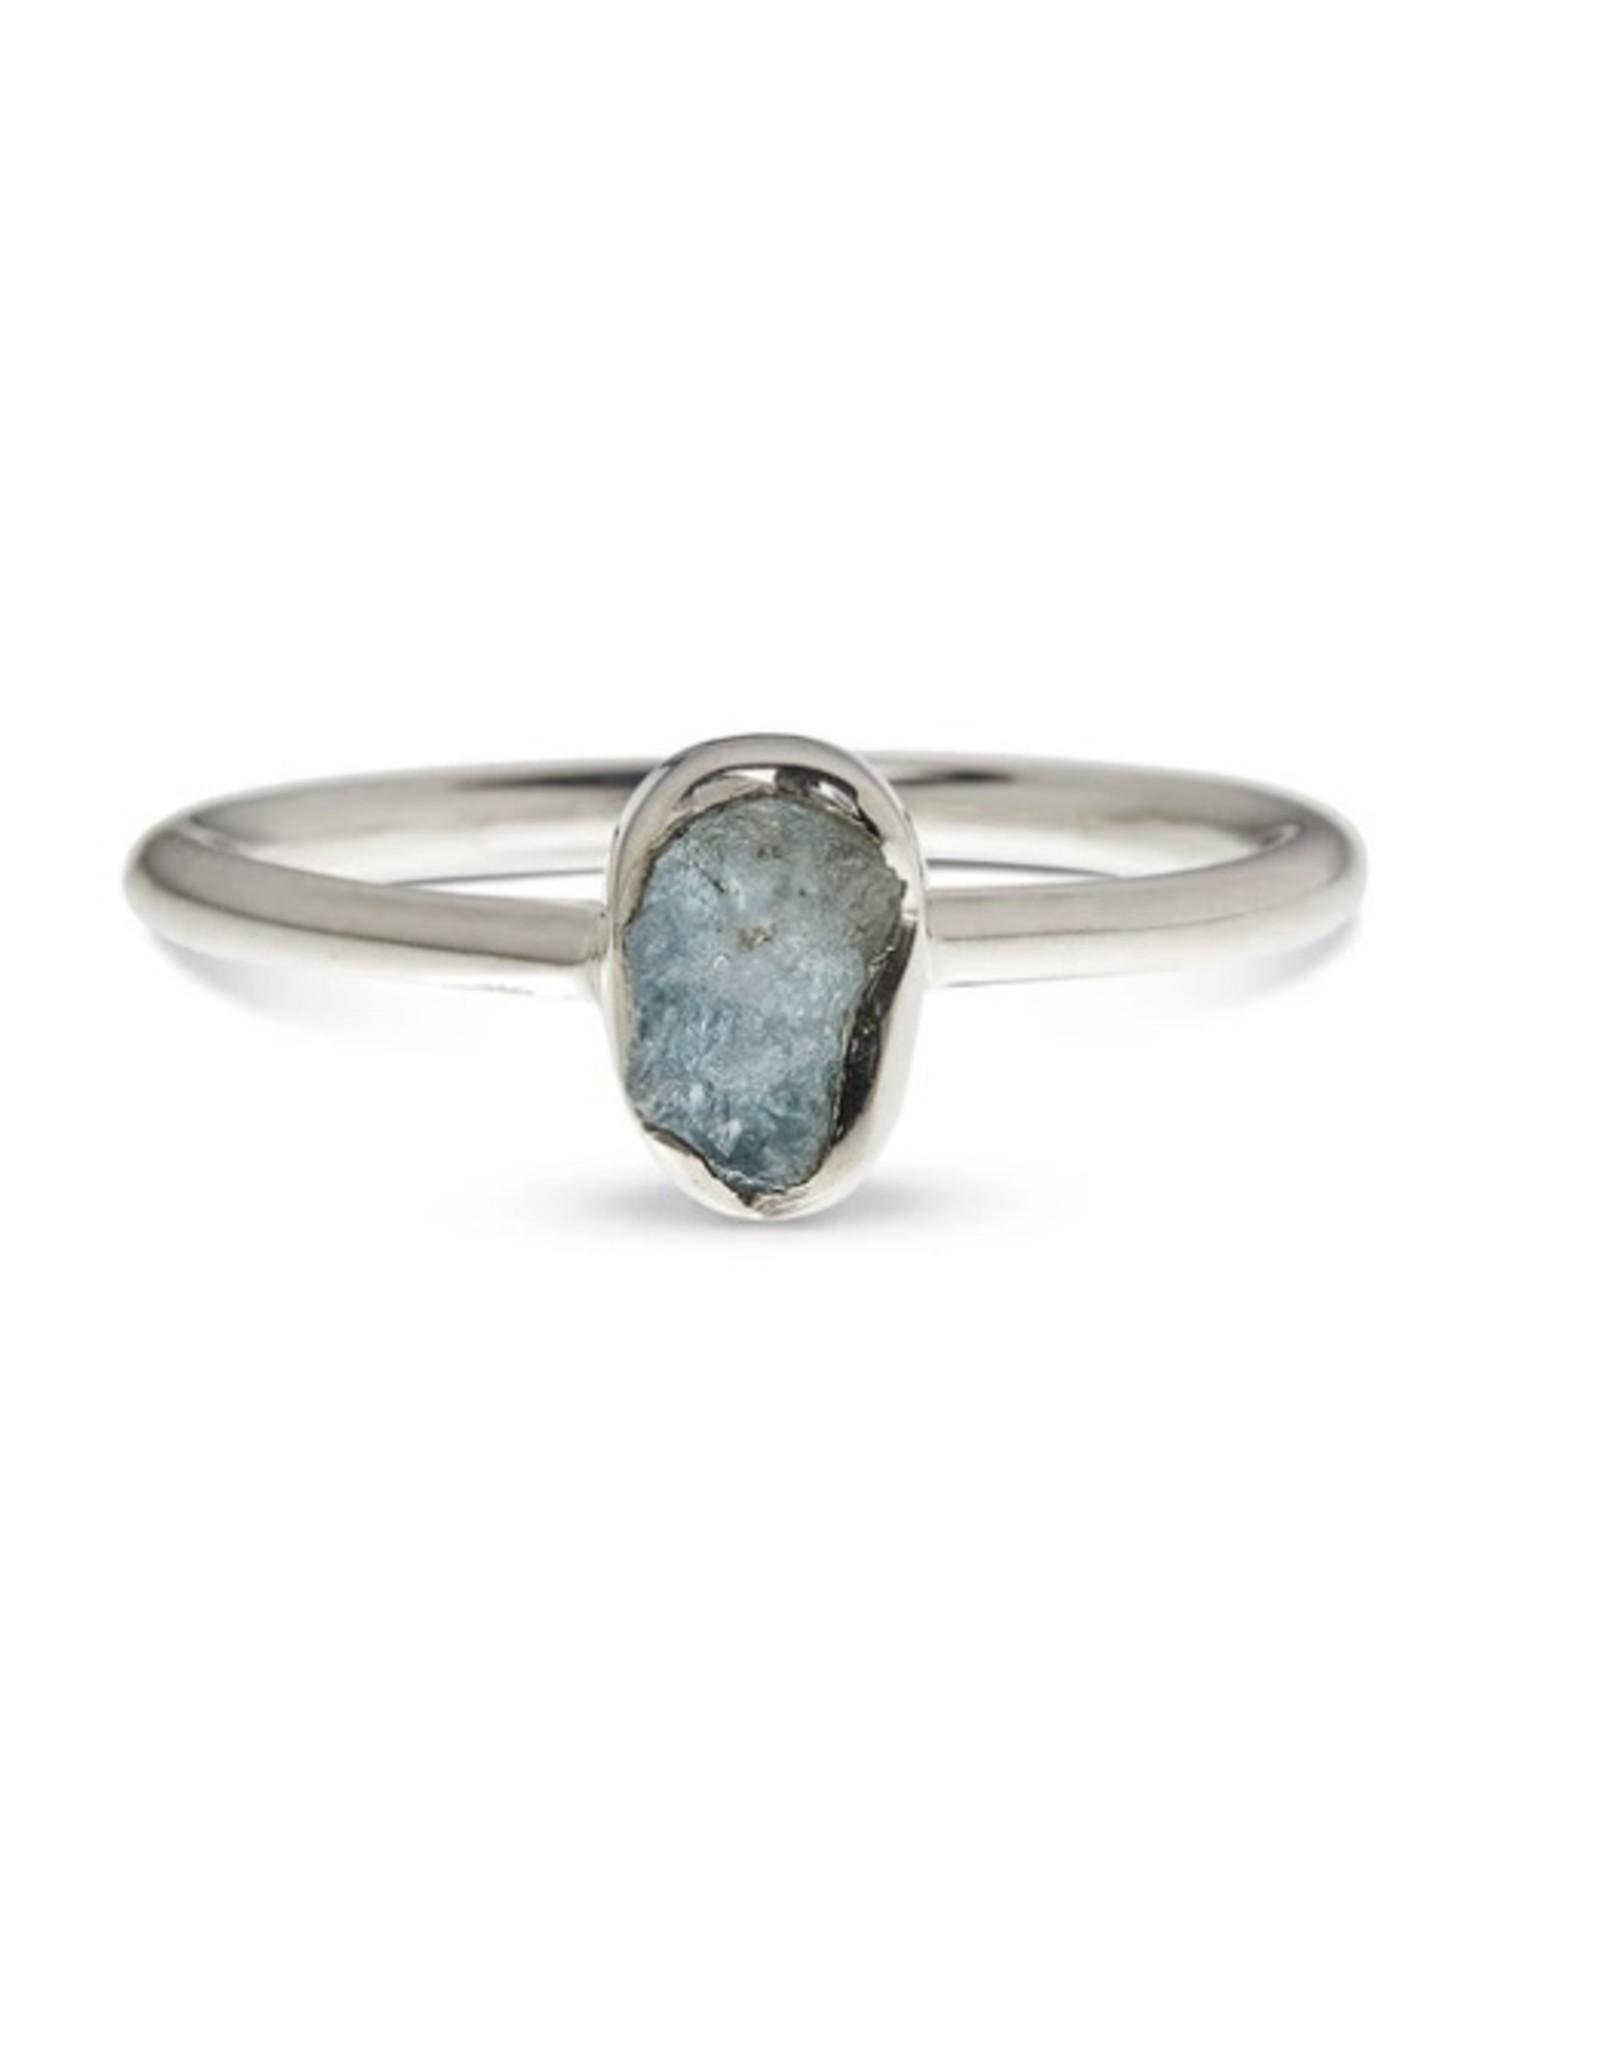 Aquamarine Ring - Size 6